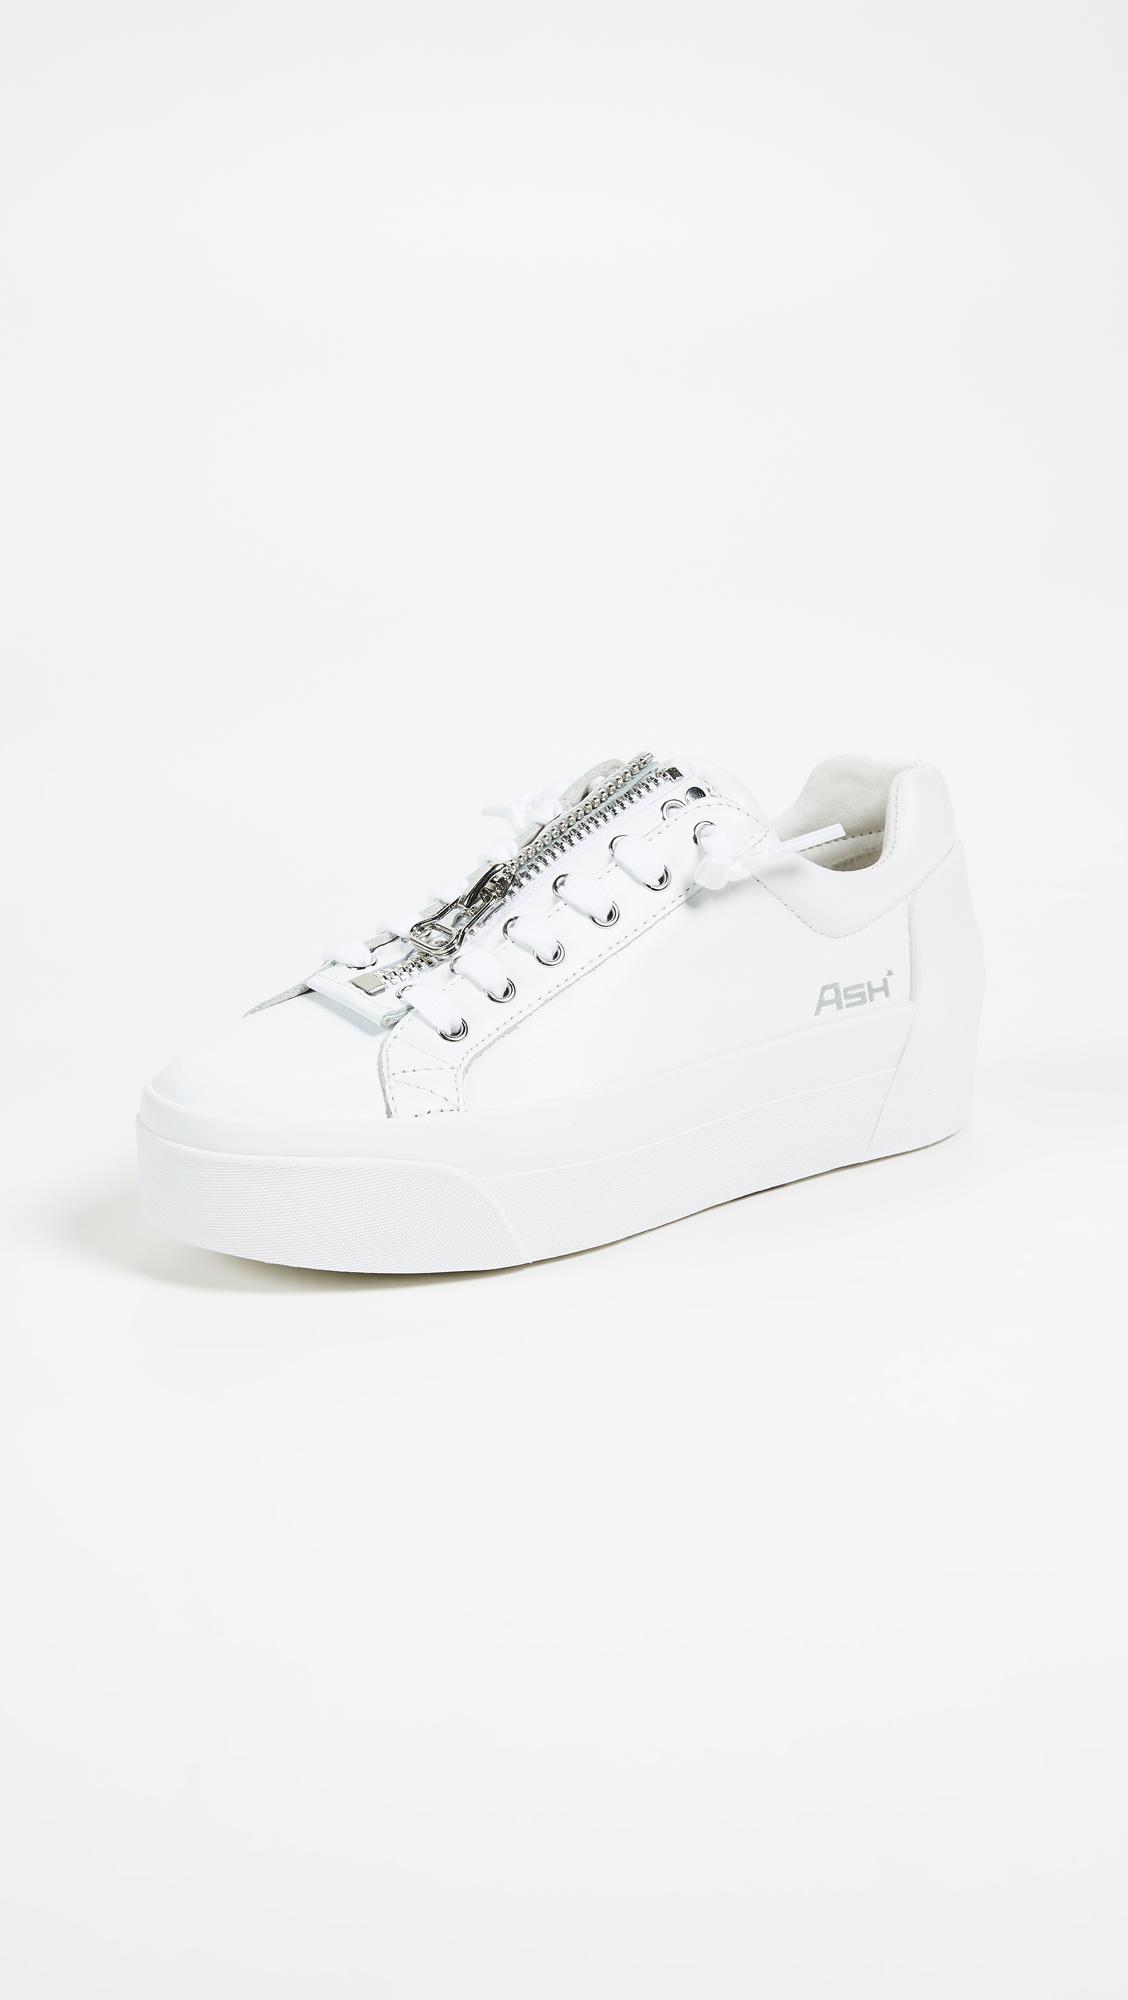 b9a5c2d061d Ash Buzz Platform Sneakers